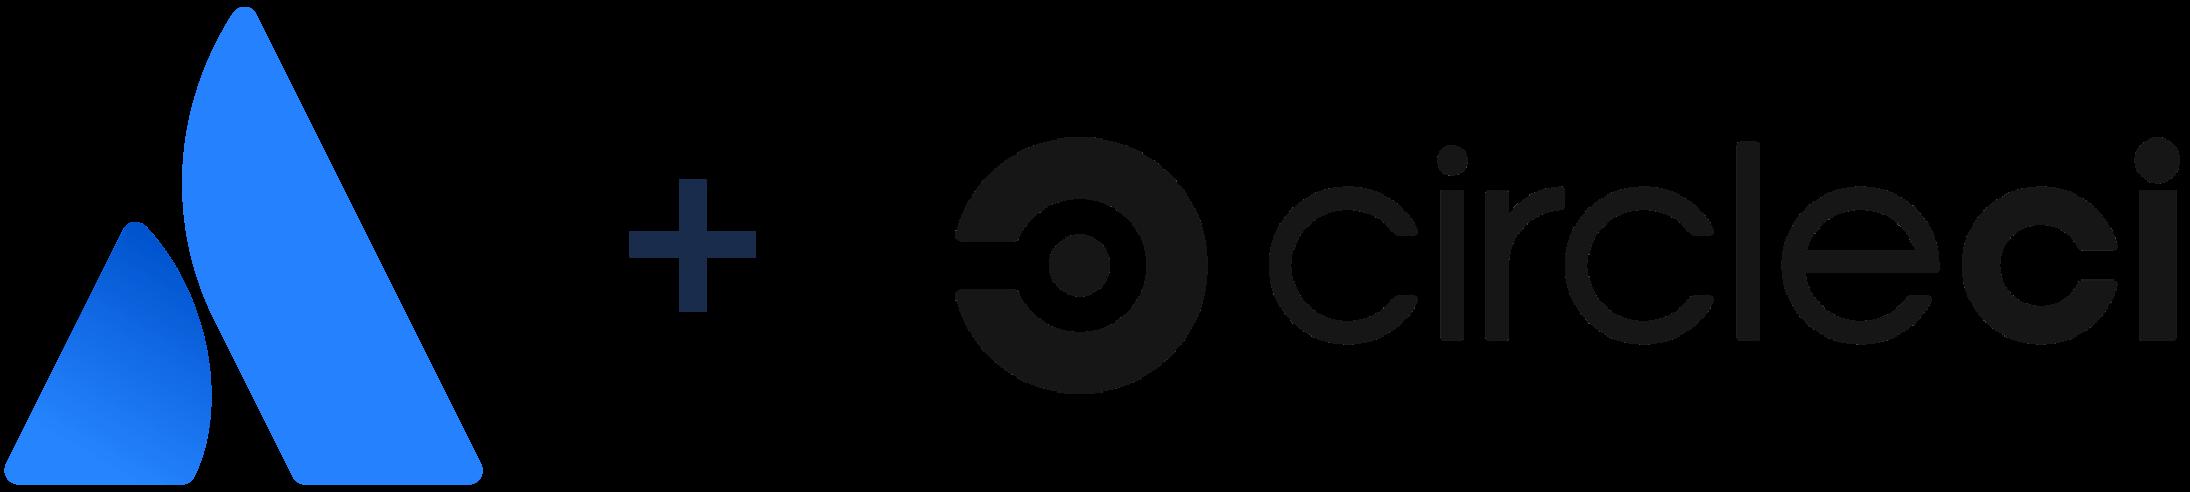 Atlassian-logo + CircleCI-logo